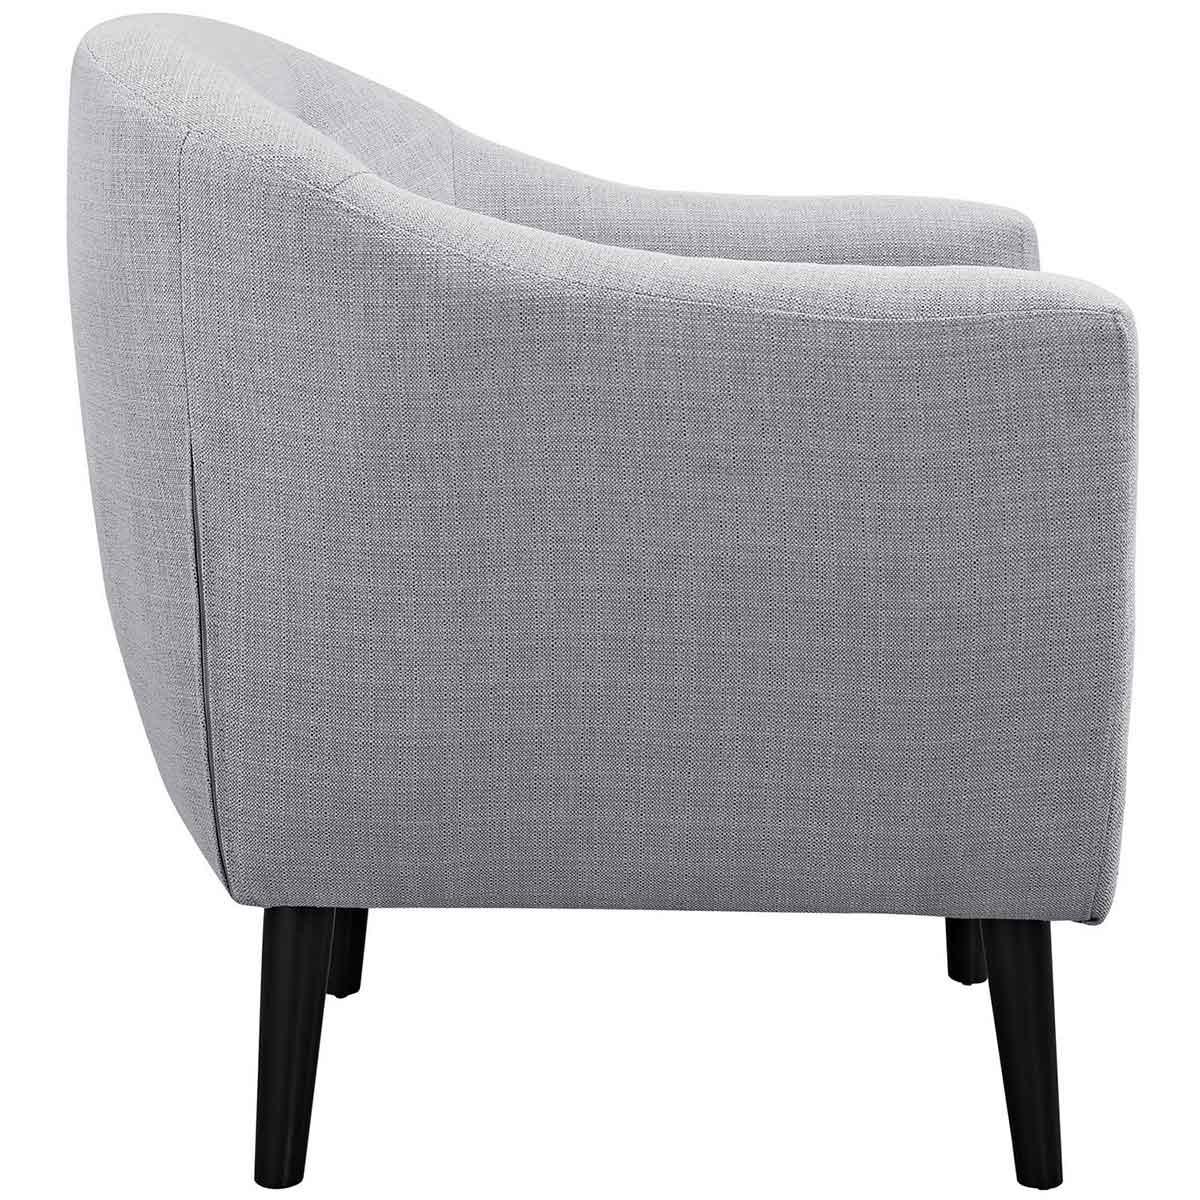 Modway Wit 2 Piece Living Room Set - Light Gray